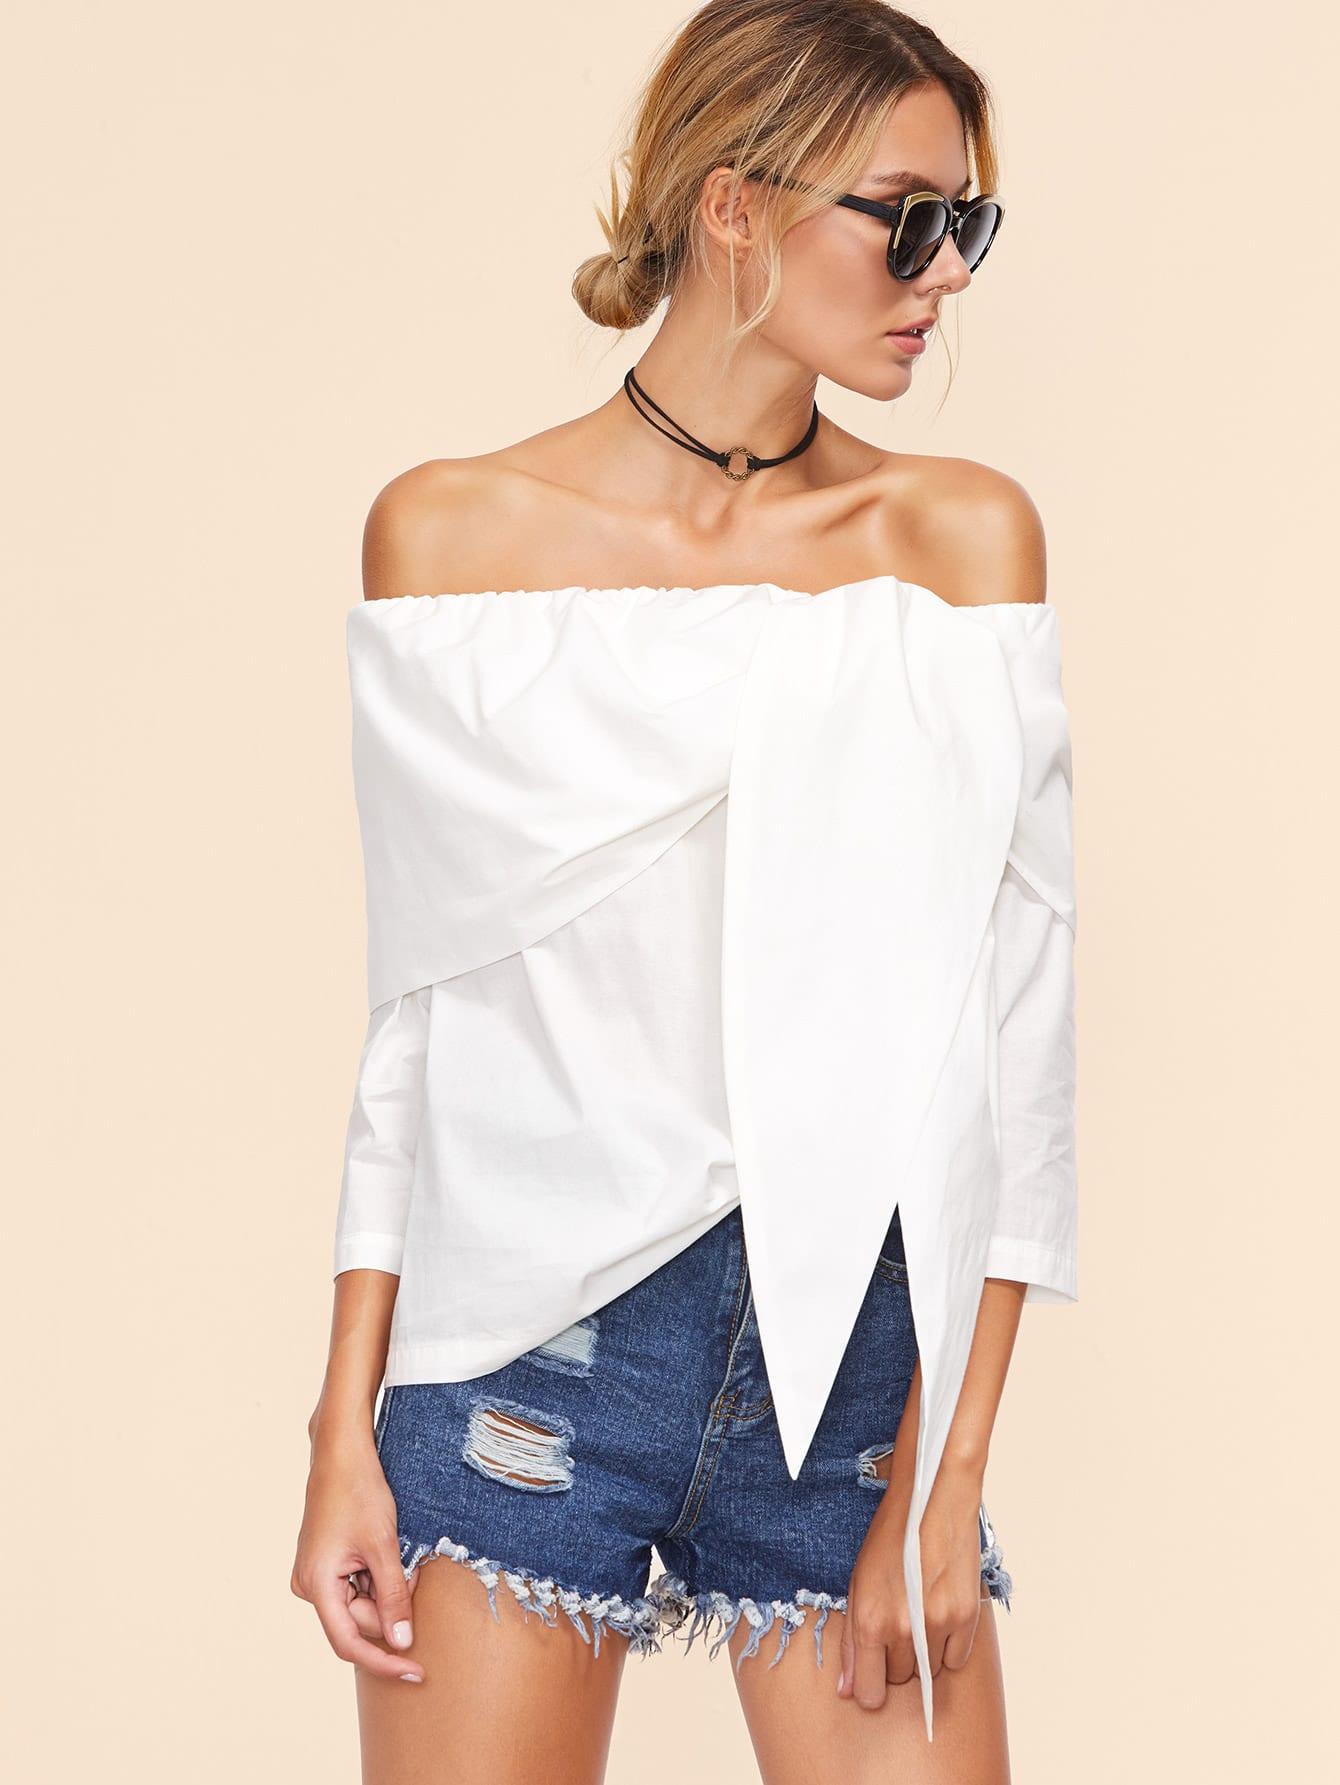 blouse161020701_2